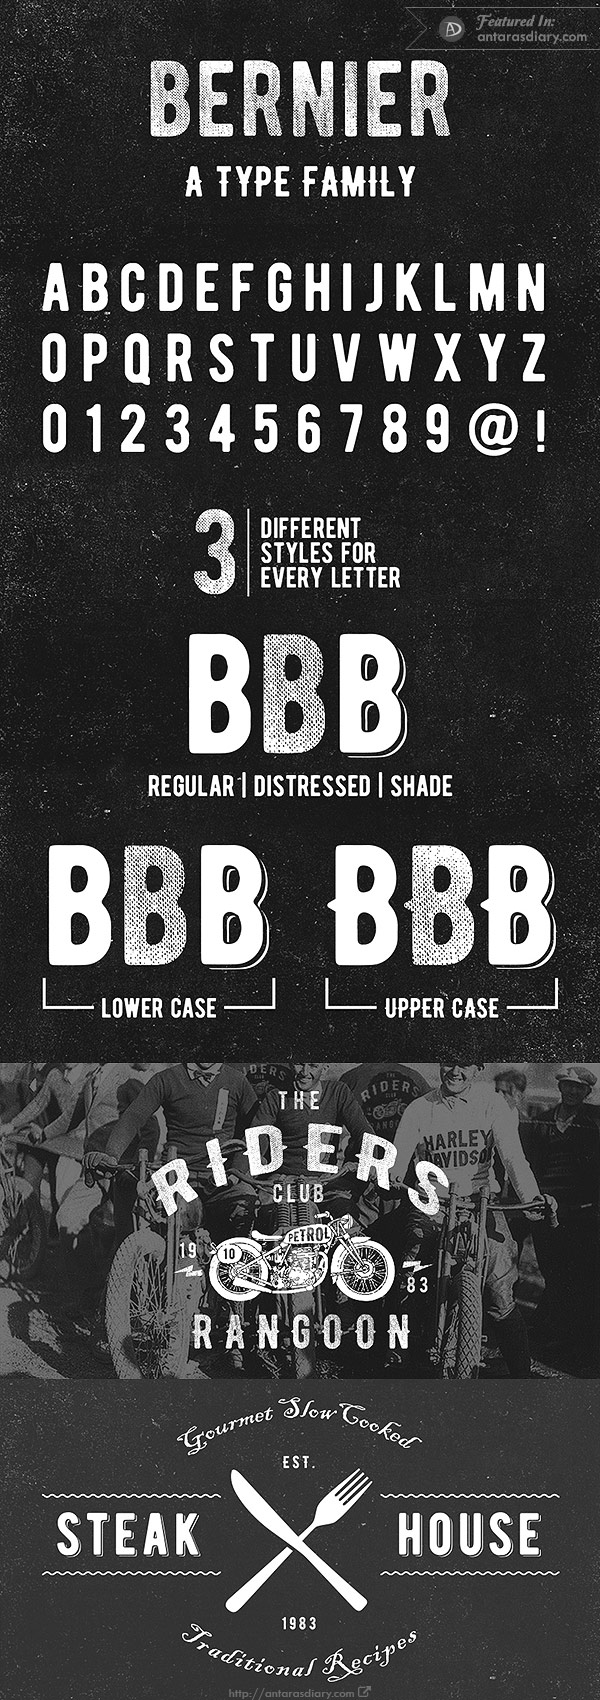 Bernier Free Vintage Font Family